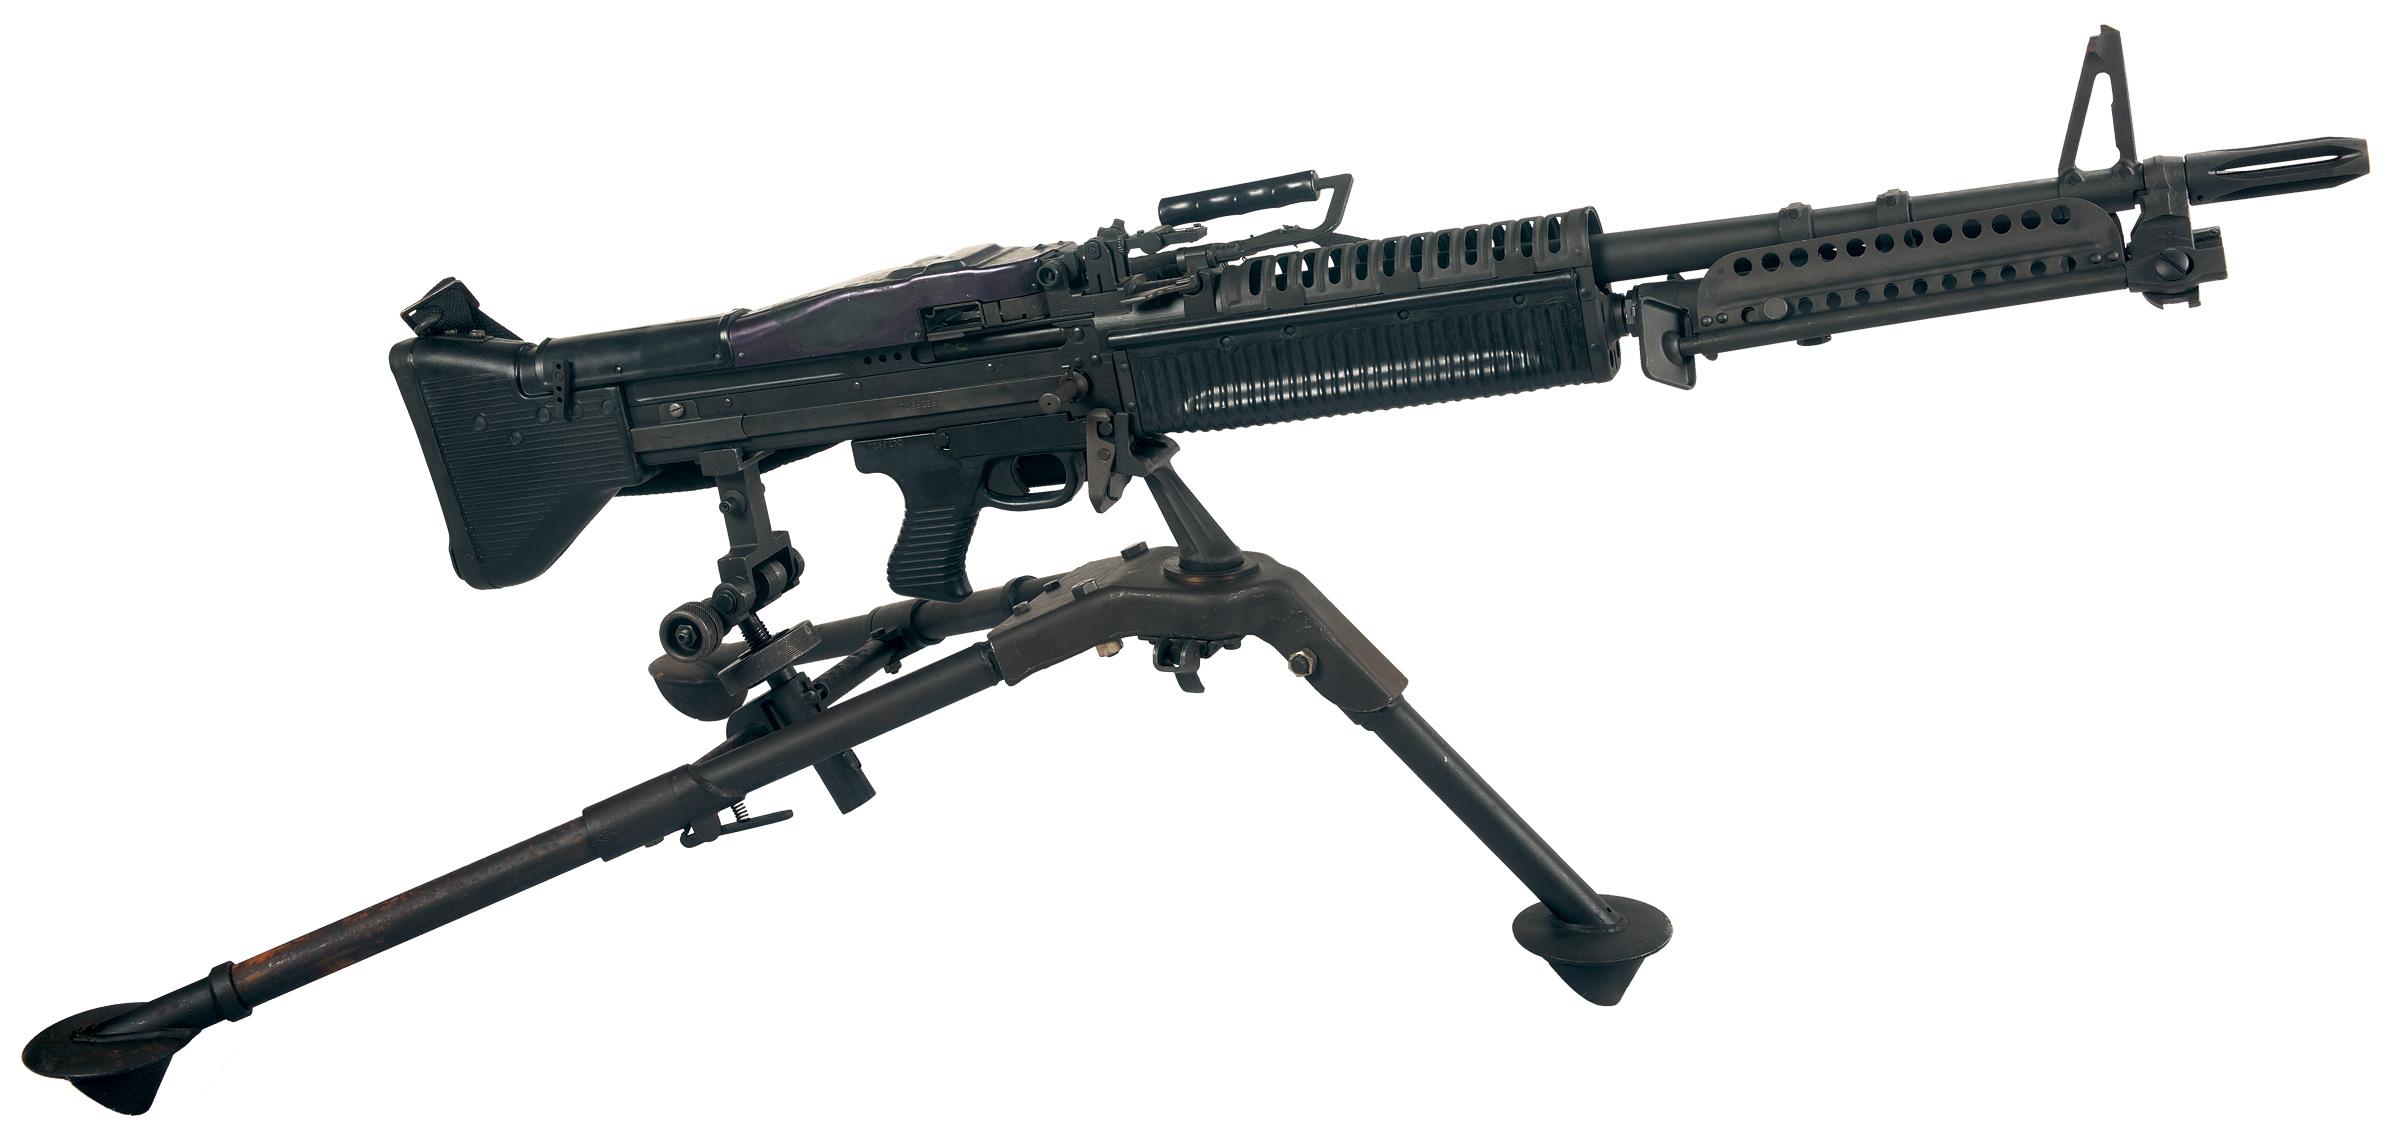 m60 machine gun - photo #8